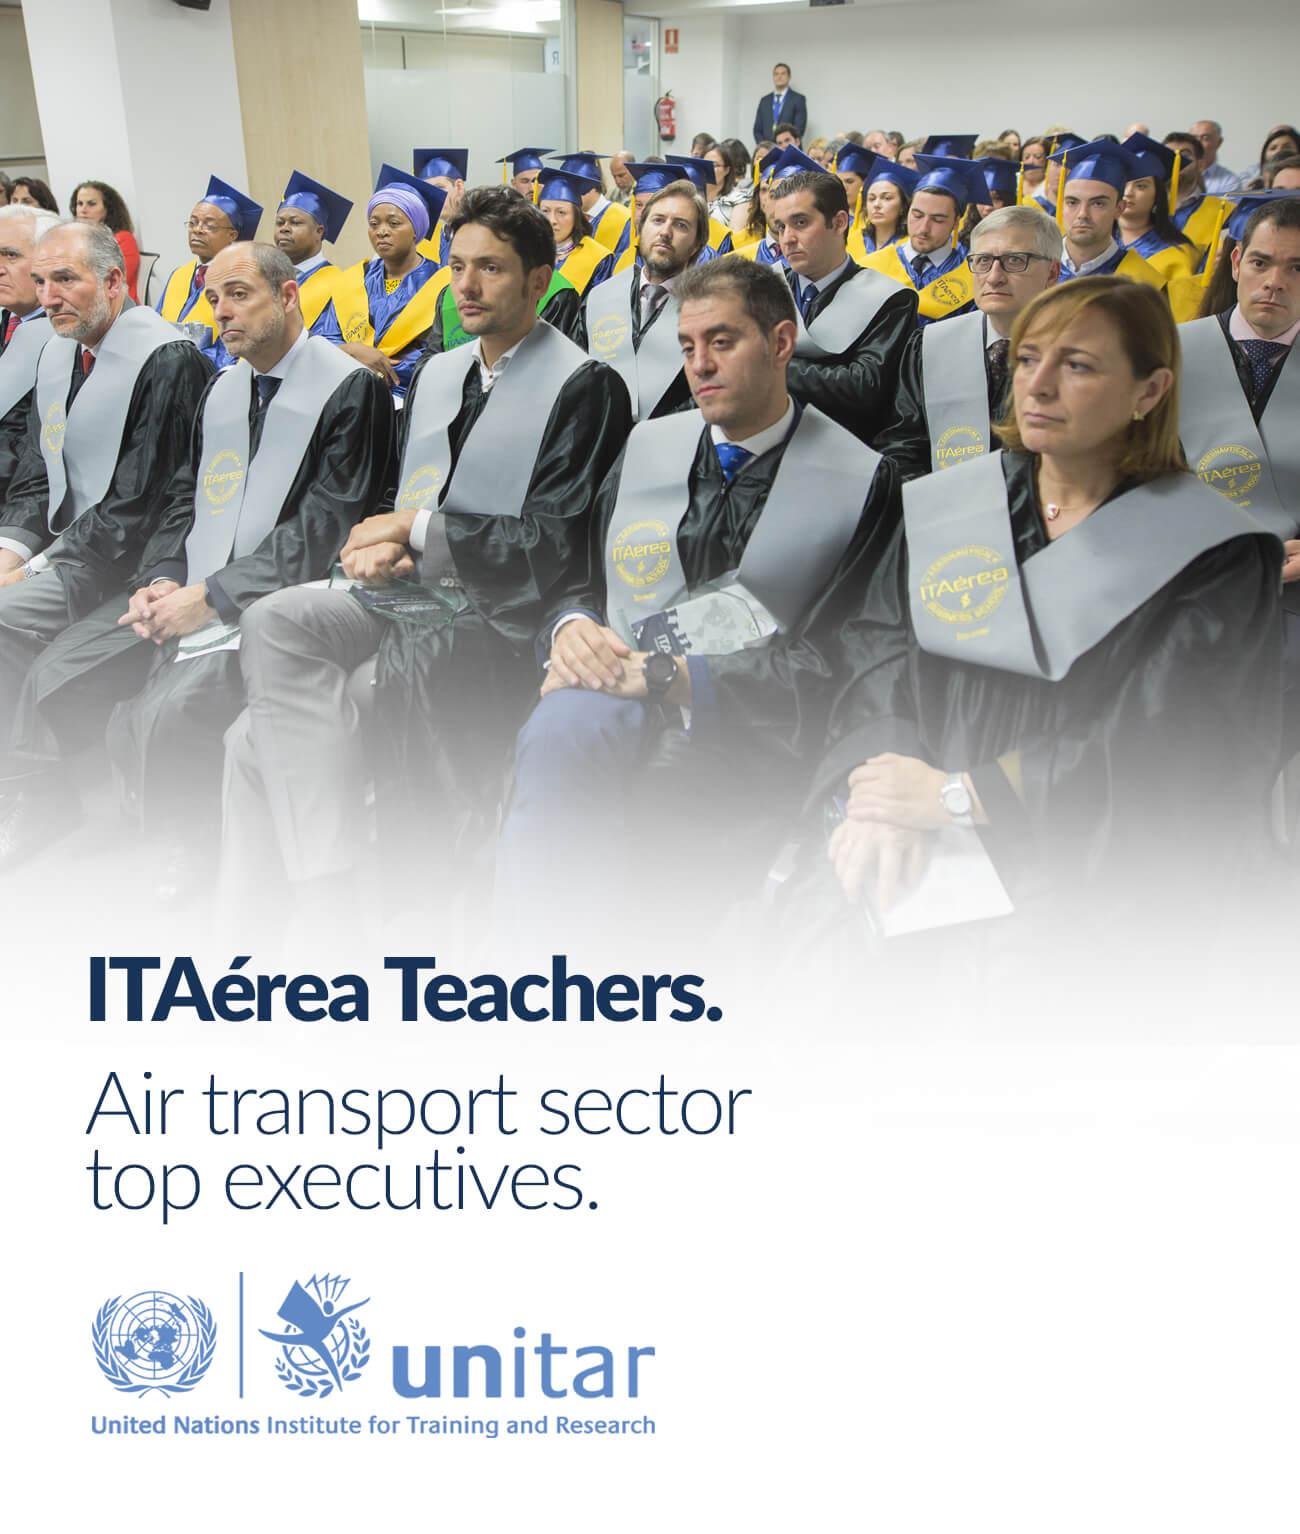 itaerea teachers mv - Home